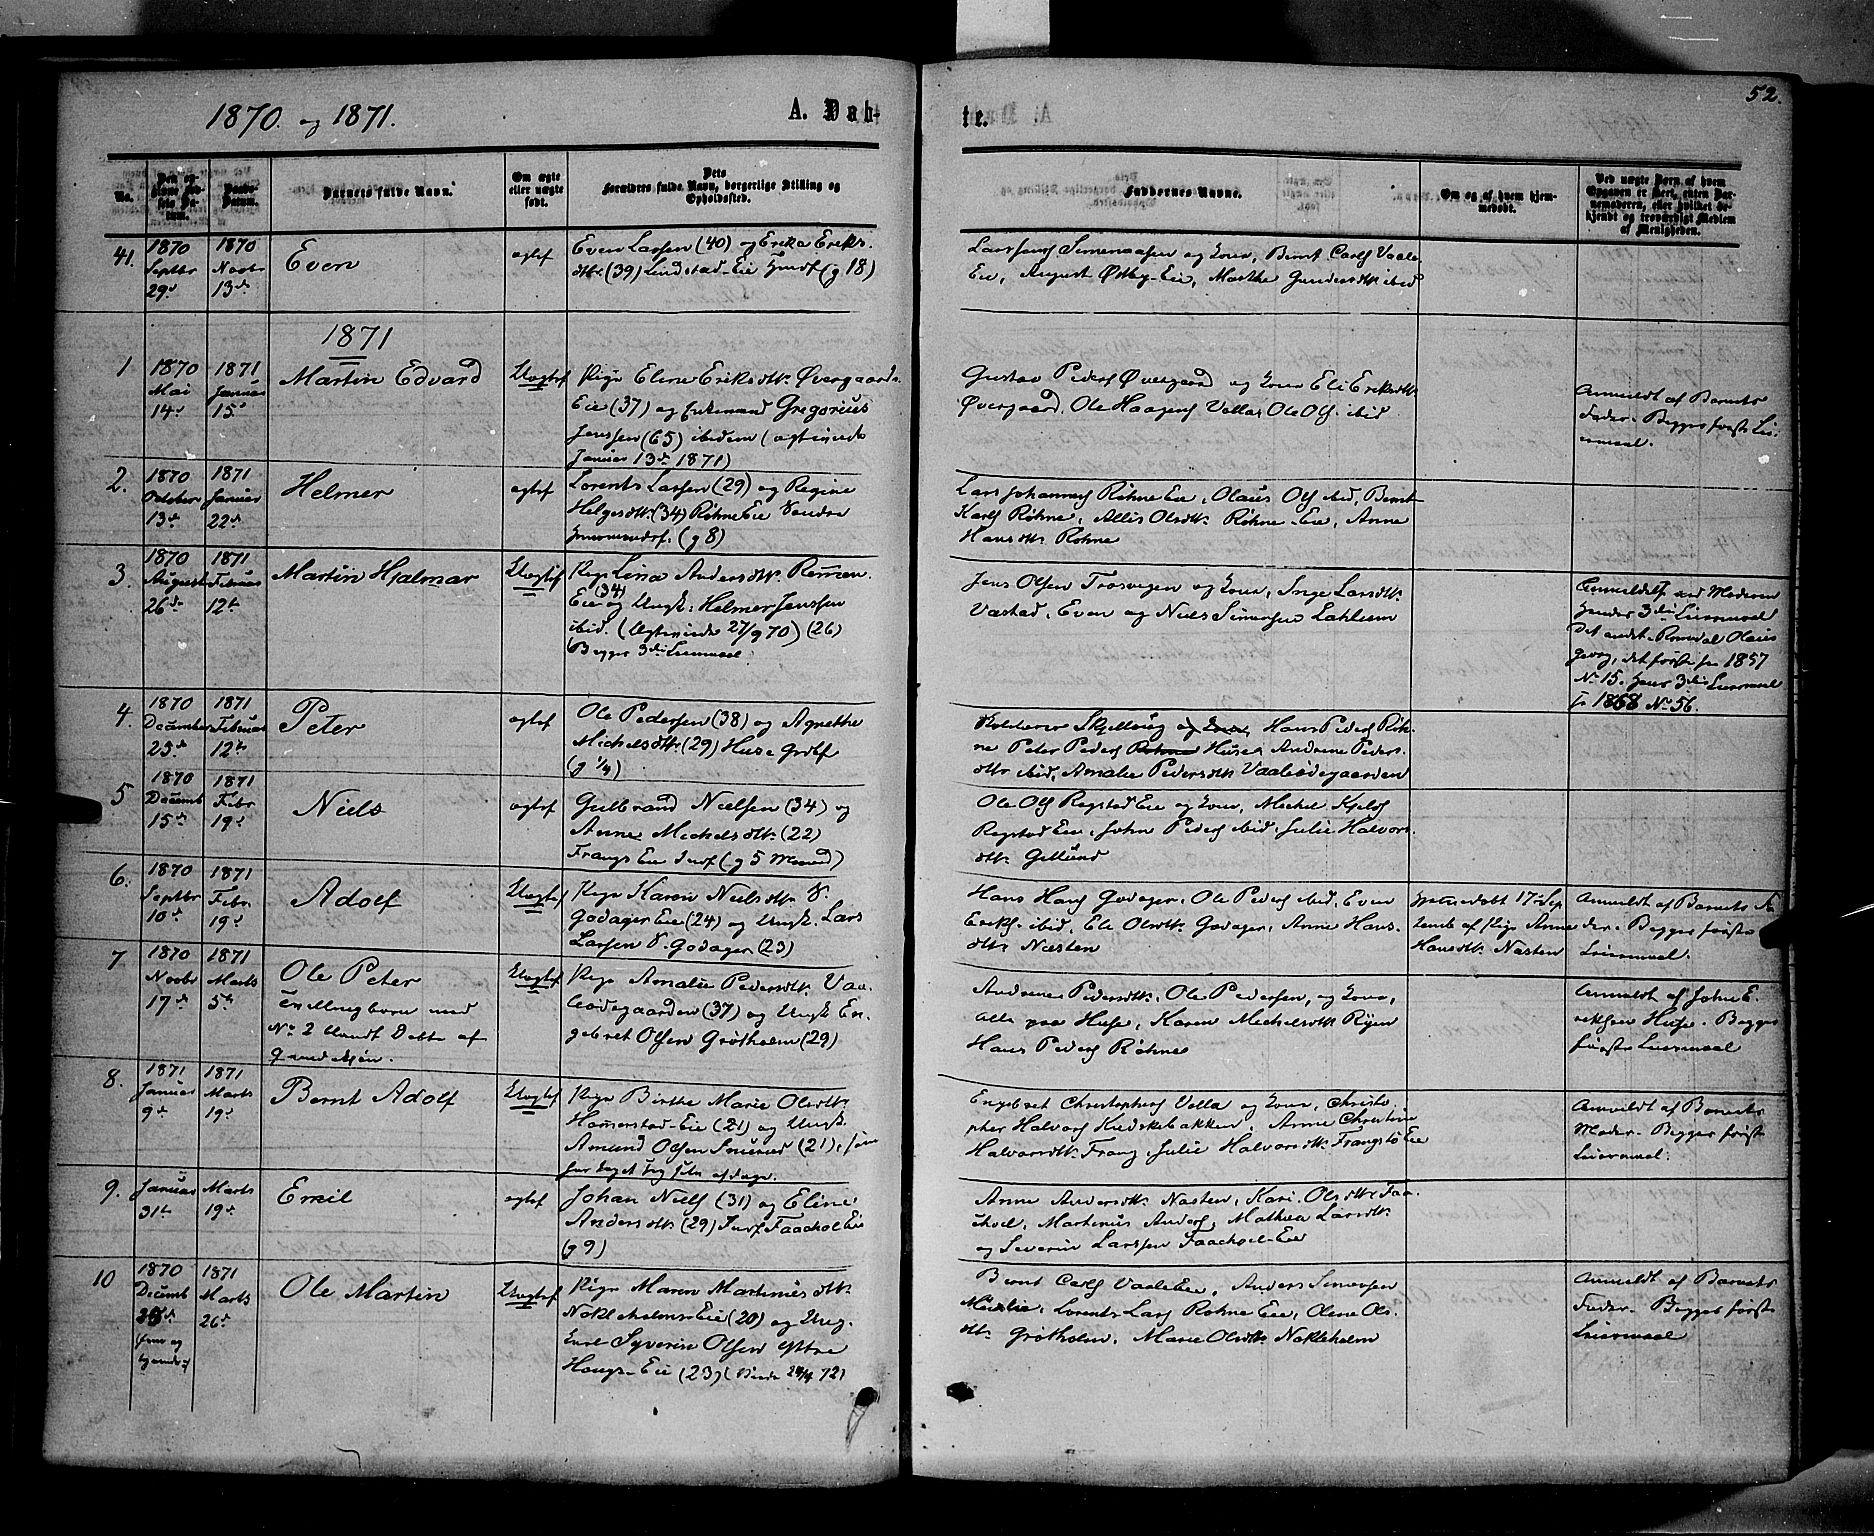 SAH, Stange prestekontor, K/L0013: Ministerialbok nr. 13, 1862-1879, s. 52